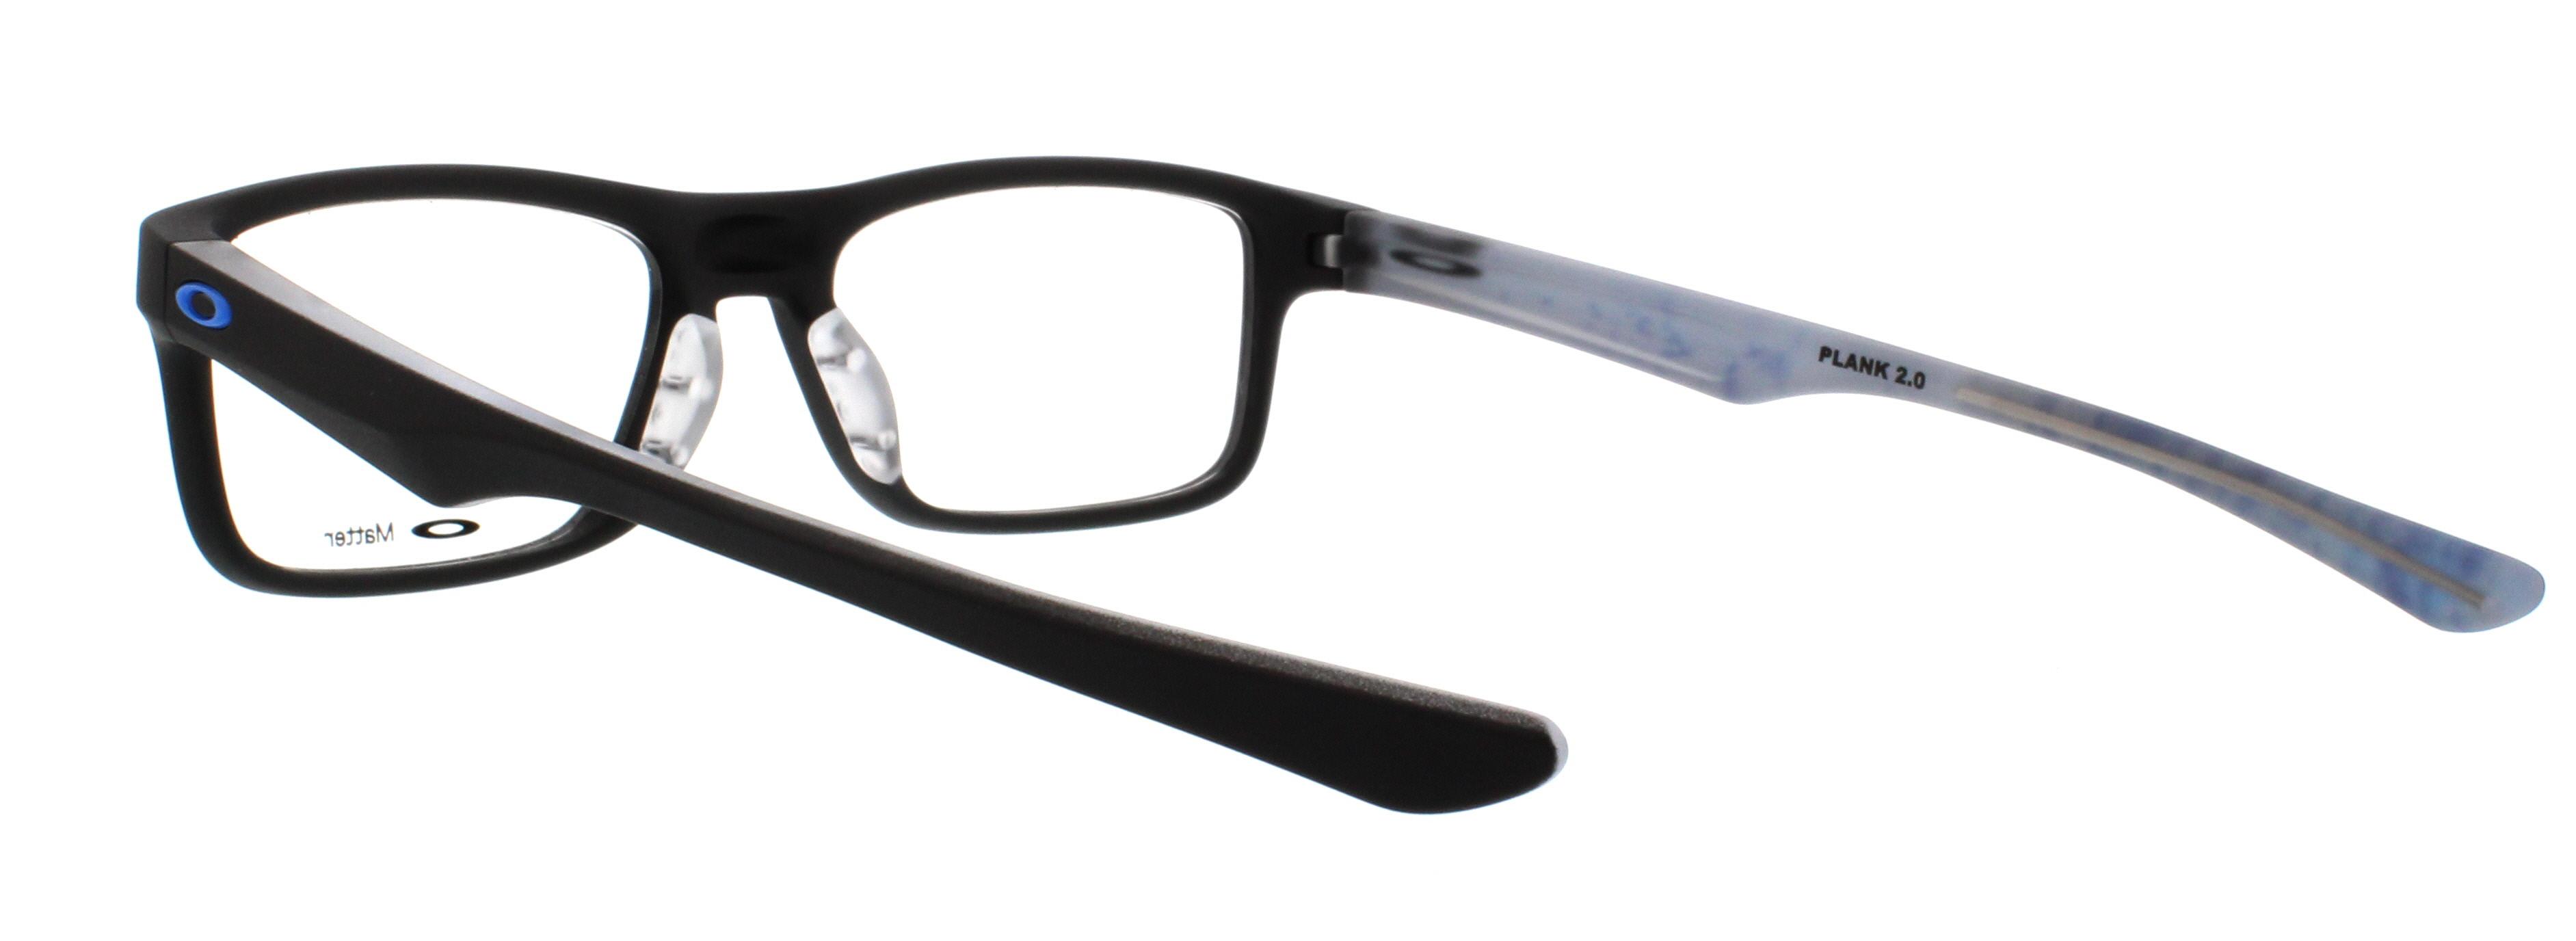 81f935dfba4 OAKLEY Eyeglasses PLANK 2.0 (OX8081-0151) Satin Black 51MM - Walmart.com